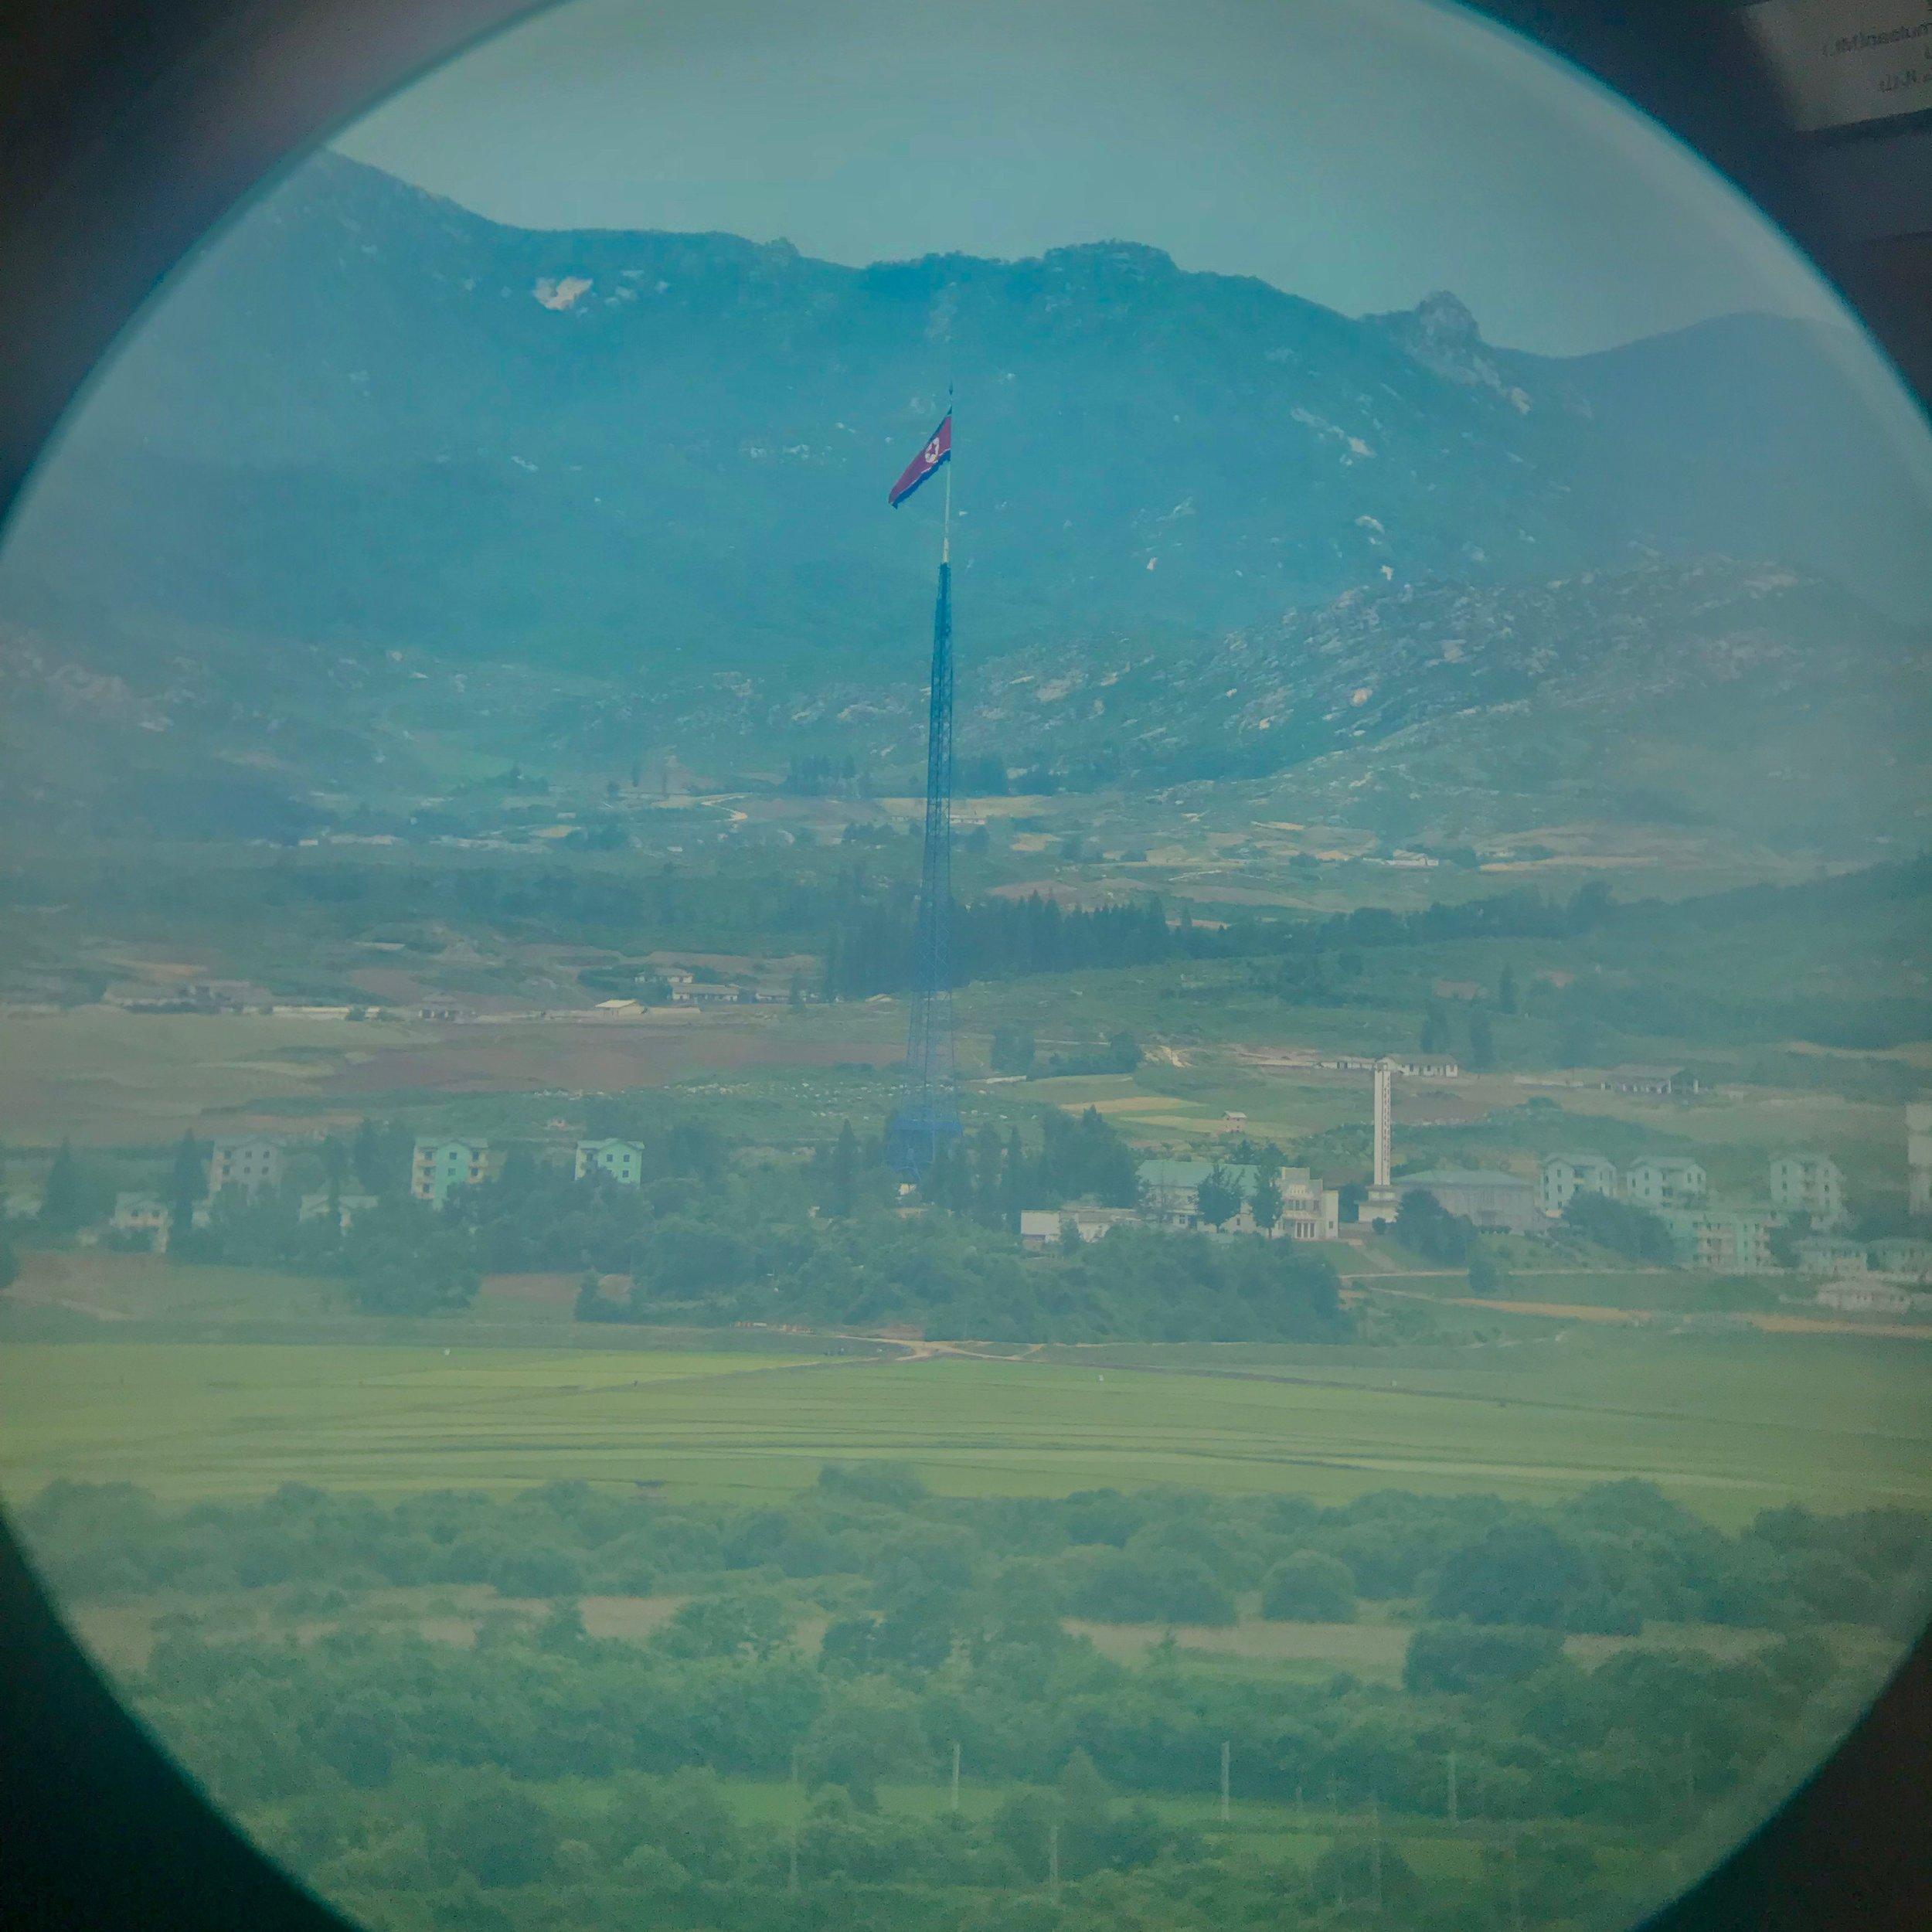 A view through binoculars